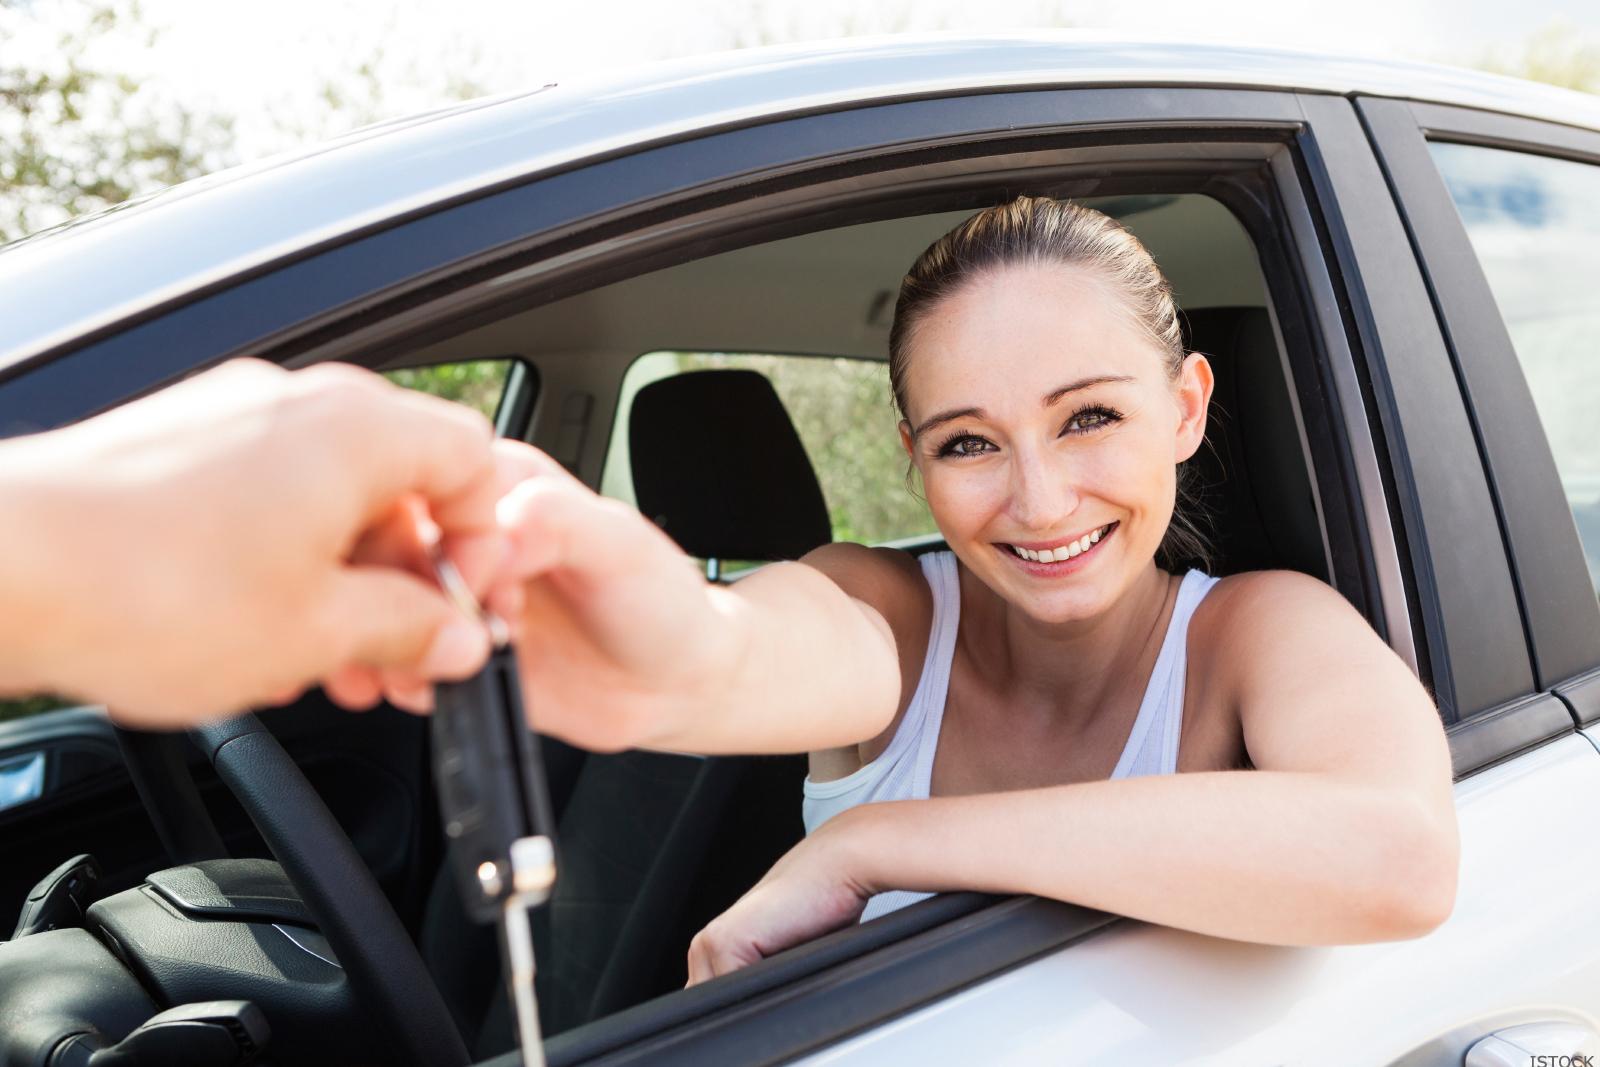 Car Rental Companies Allow Under